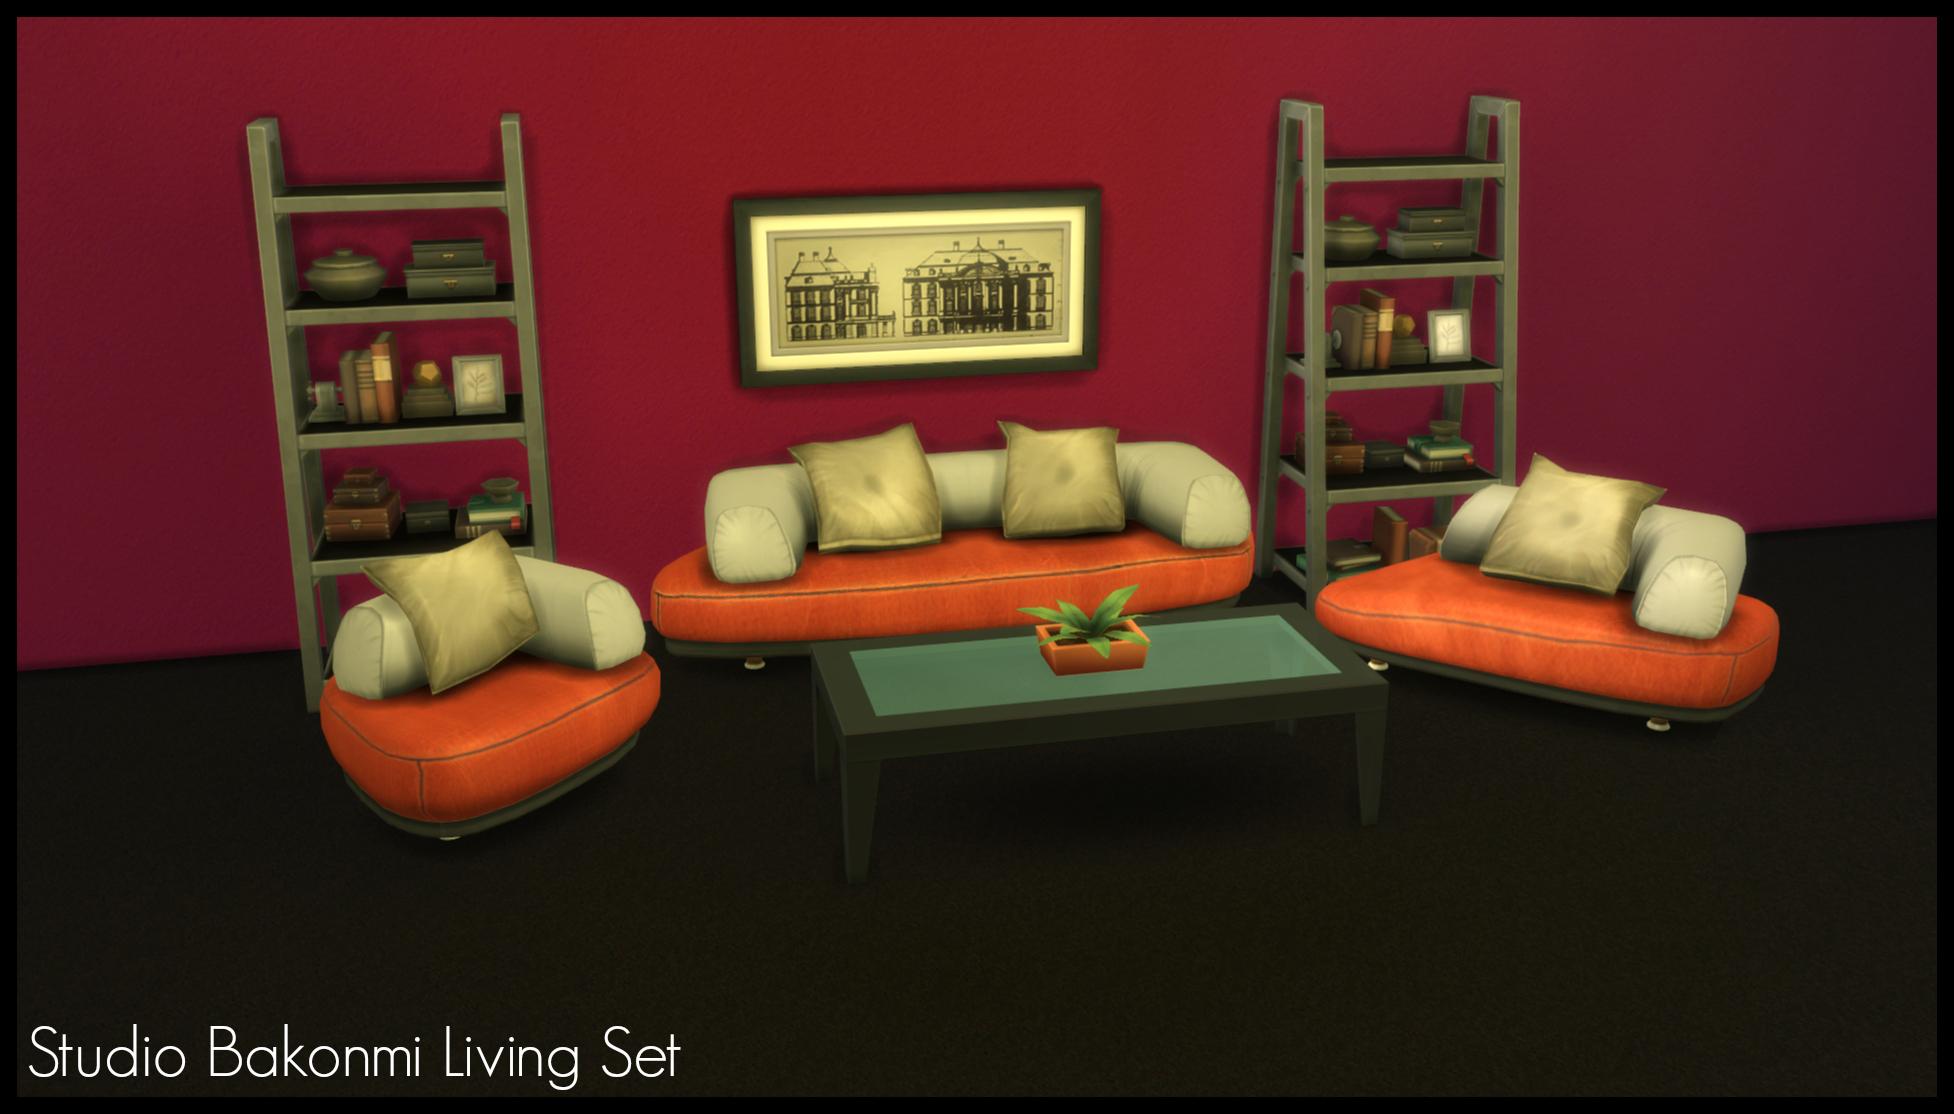 Mod The Sims - *UPDATED 30/5/18* TS2 to TS4 - Studio Bakonmi